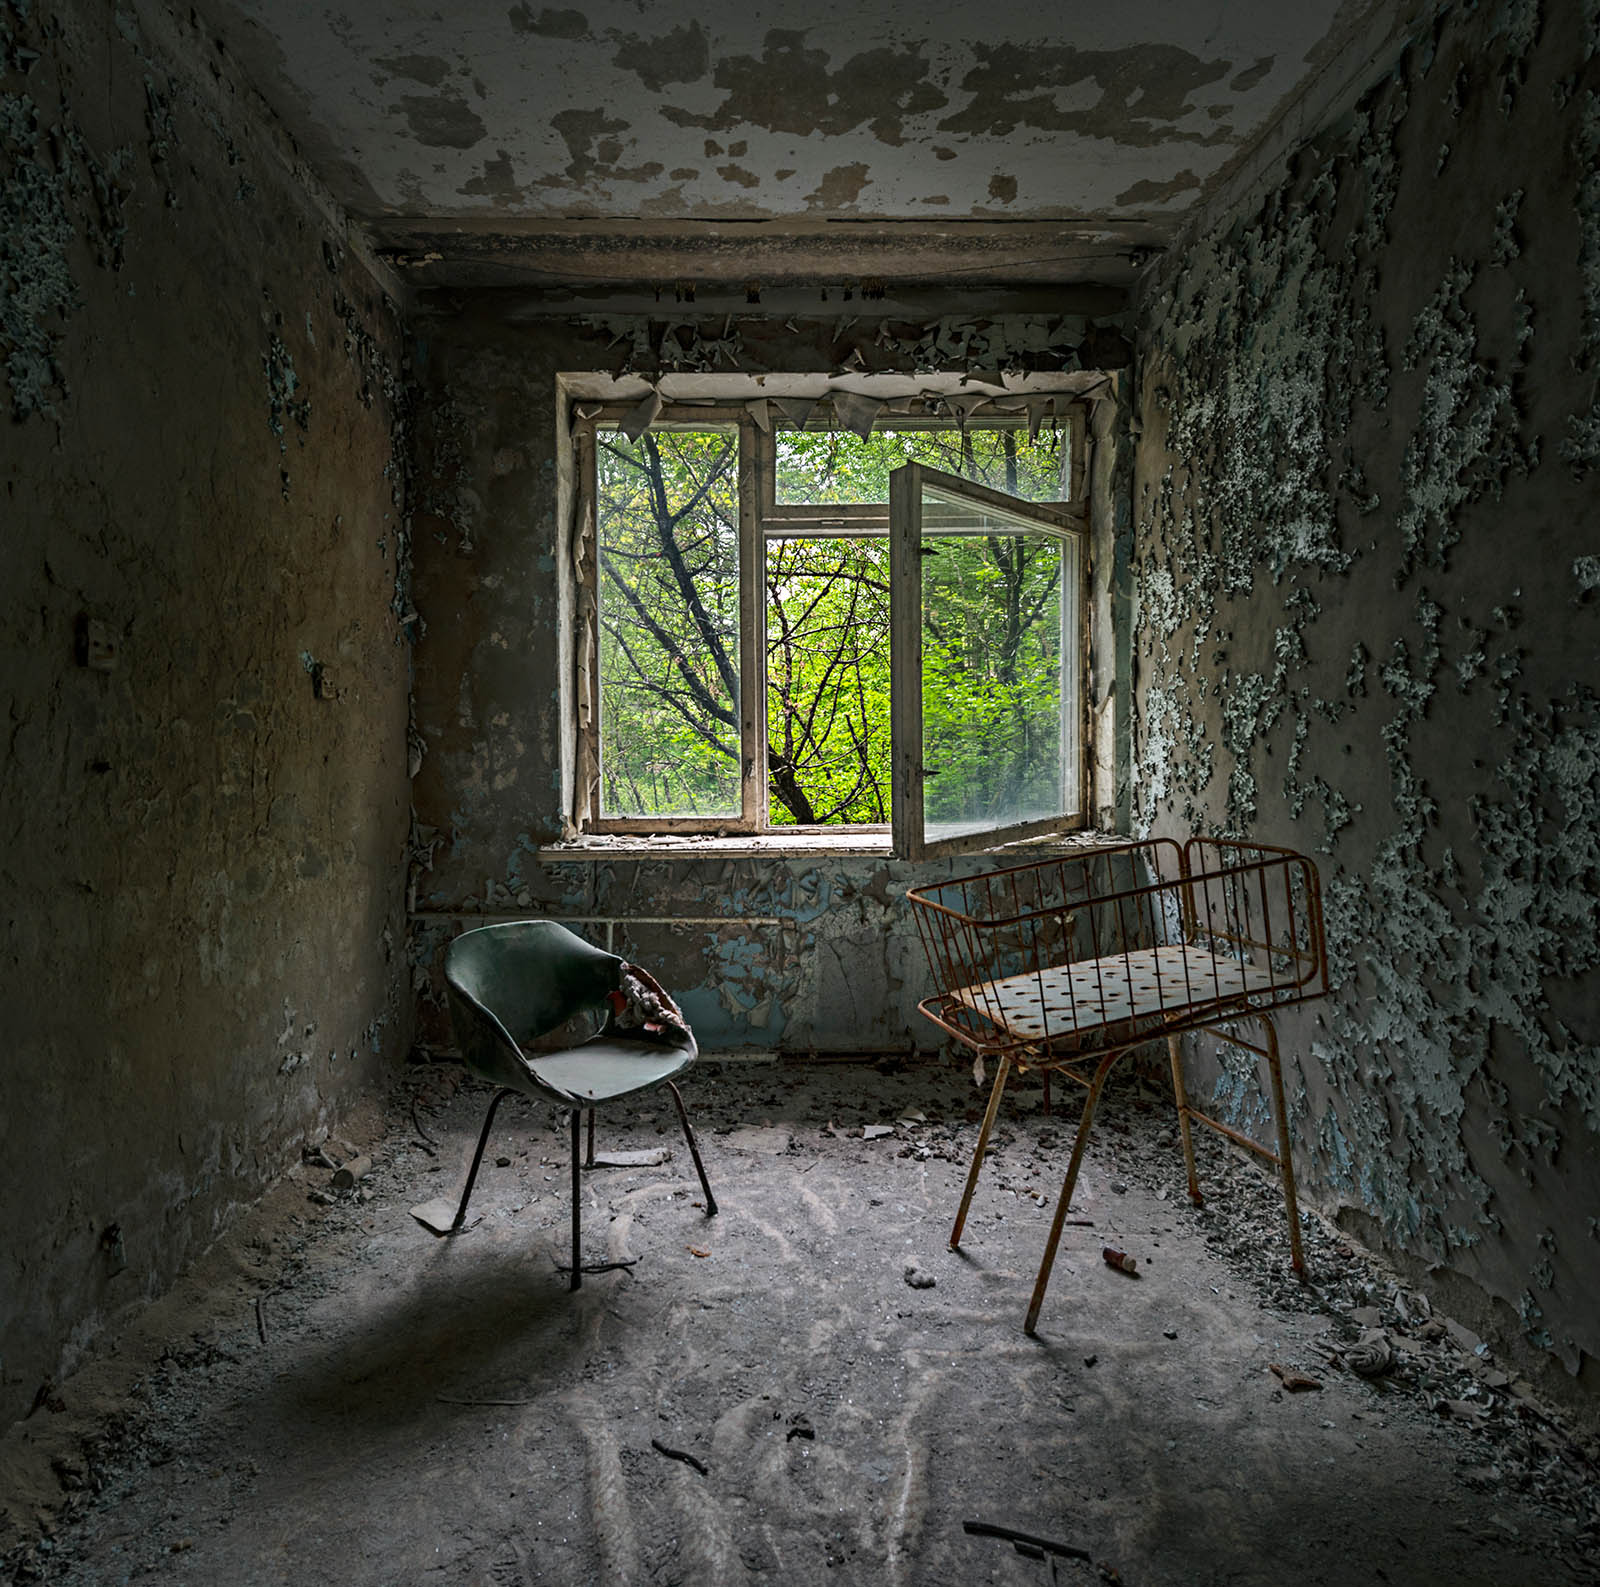 Maternity Ward Chernobyl